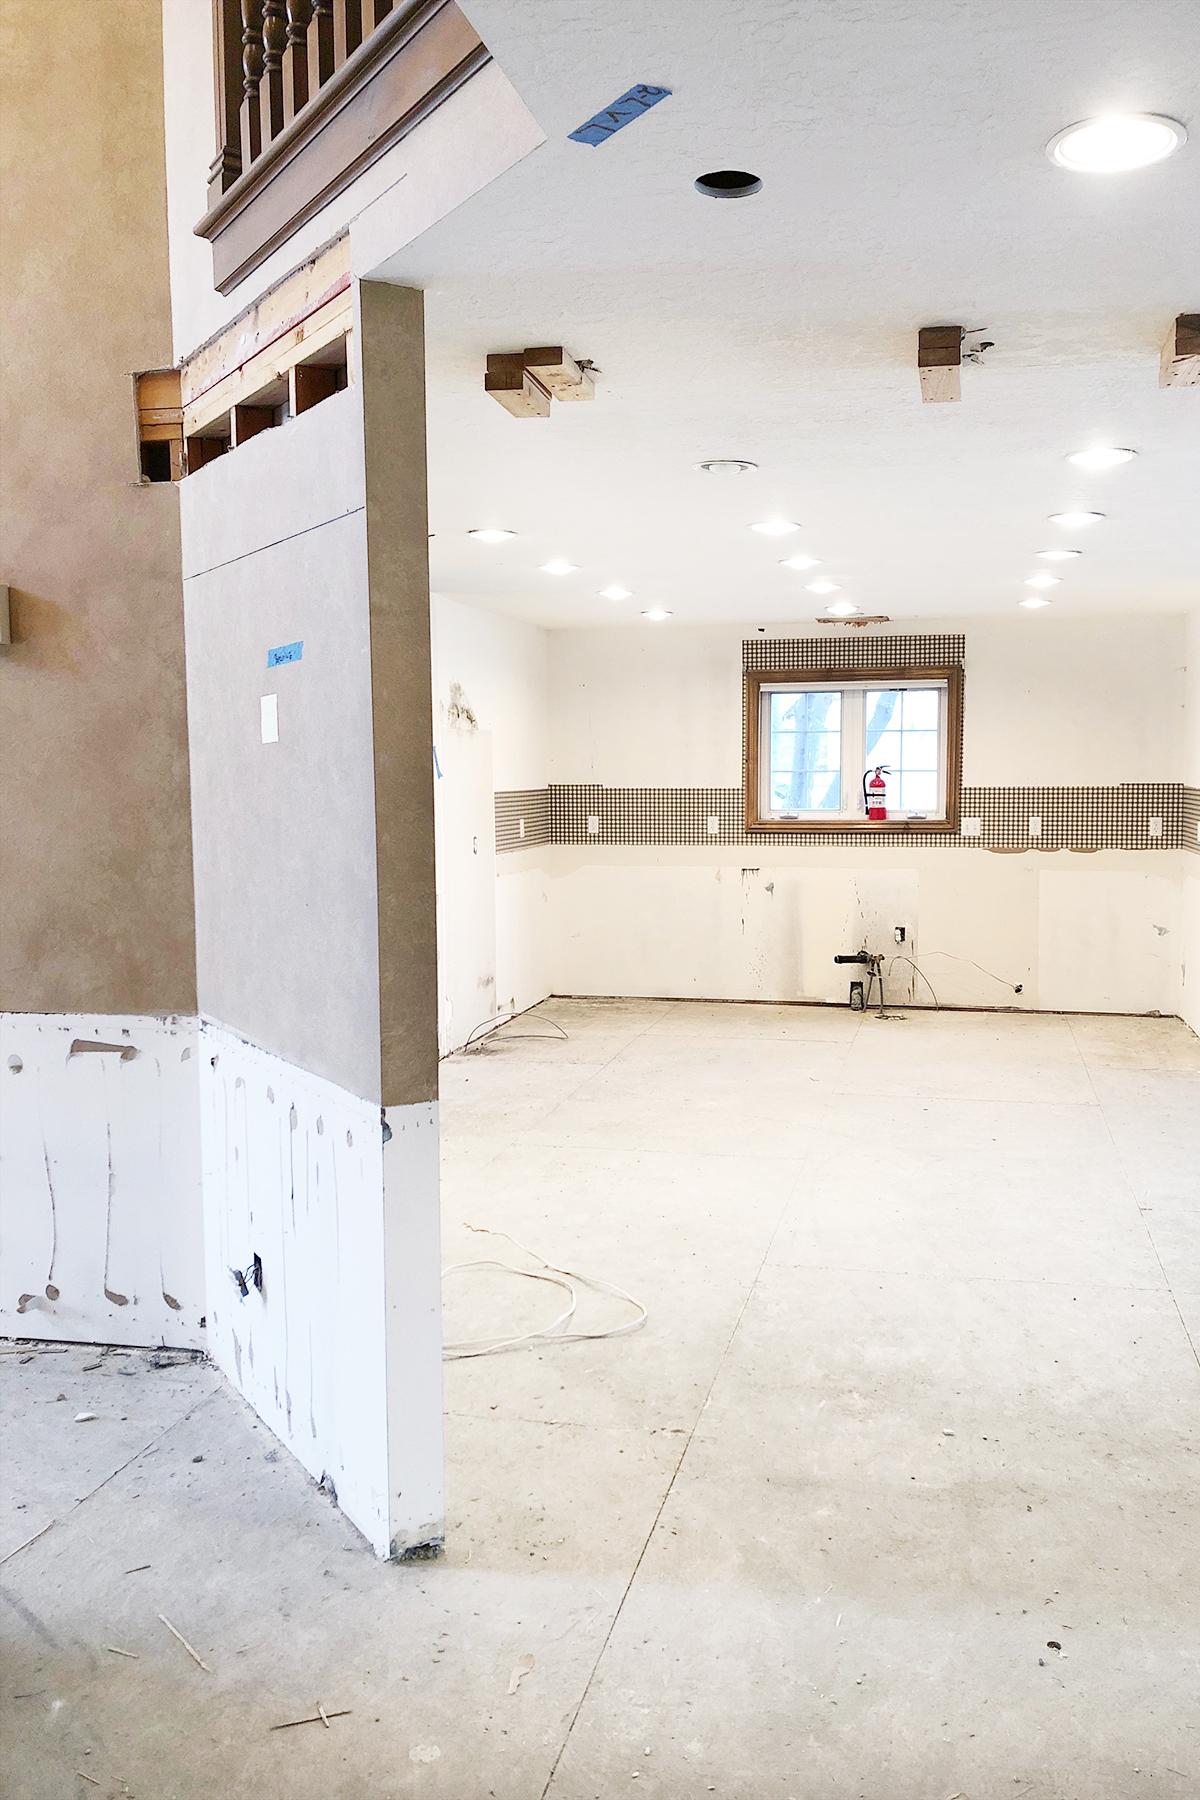 Kitchen wall 1